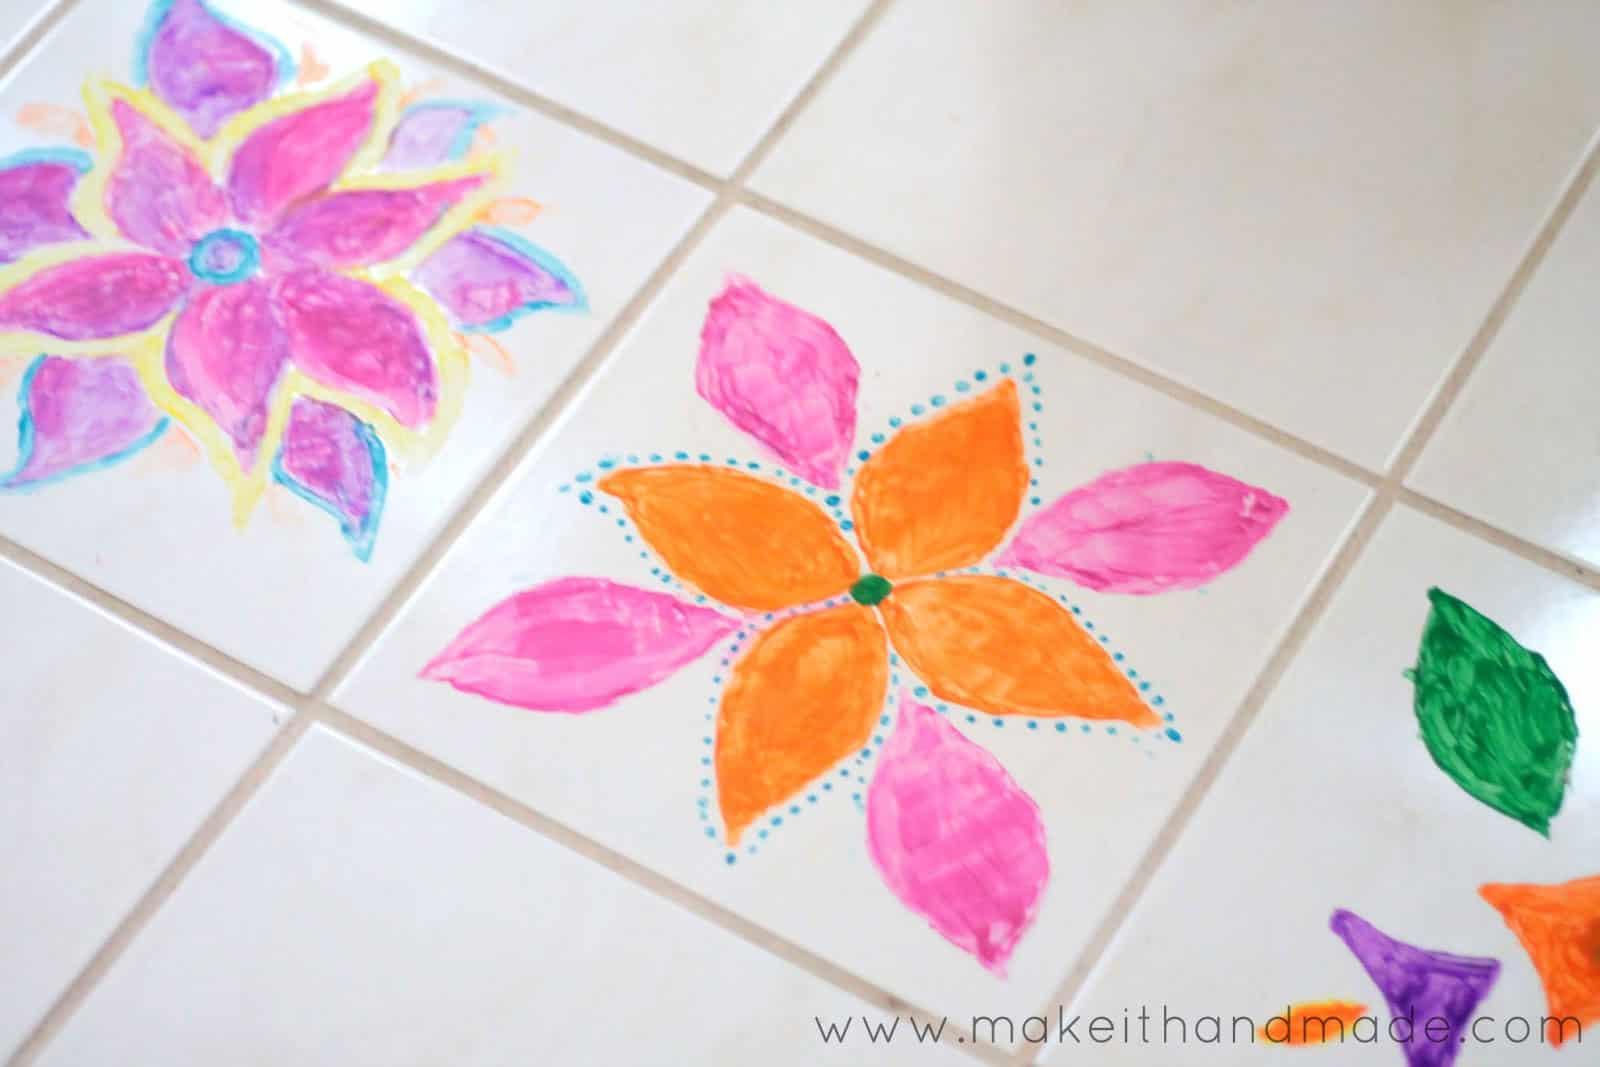 8 Diwali Kids Crafts